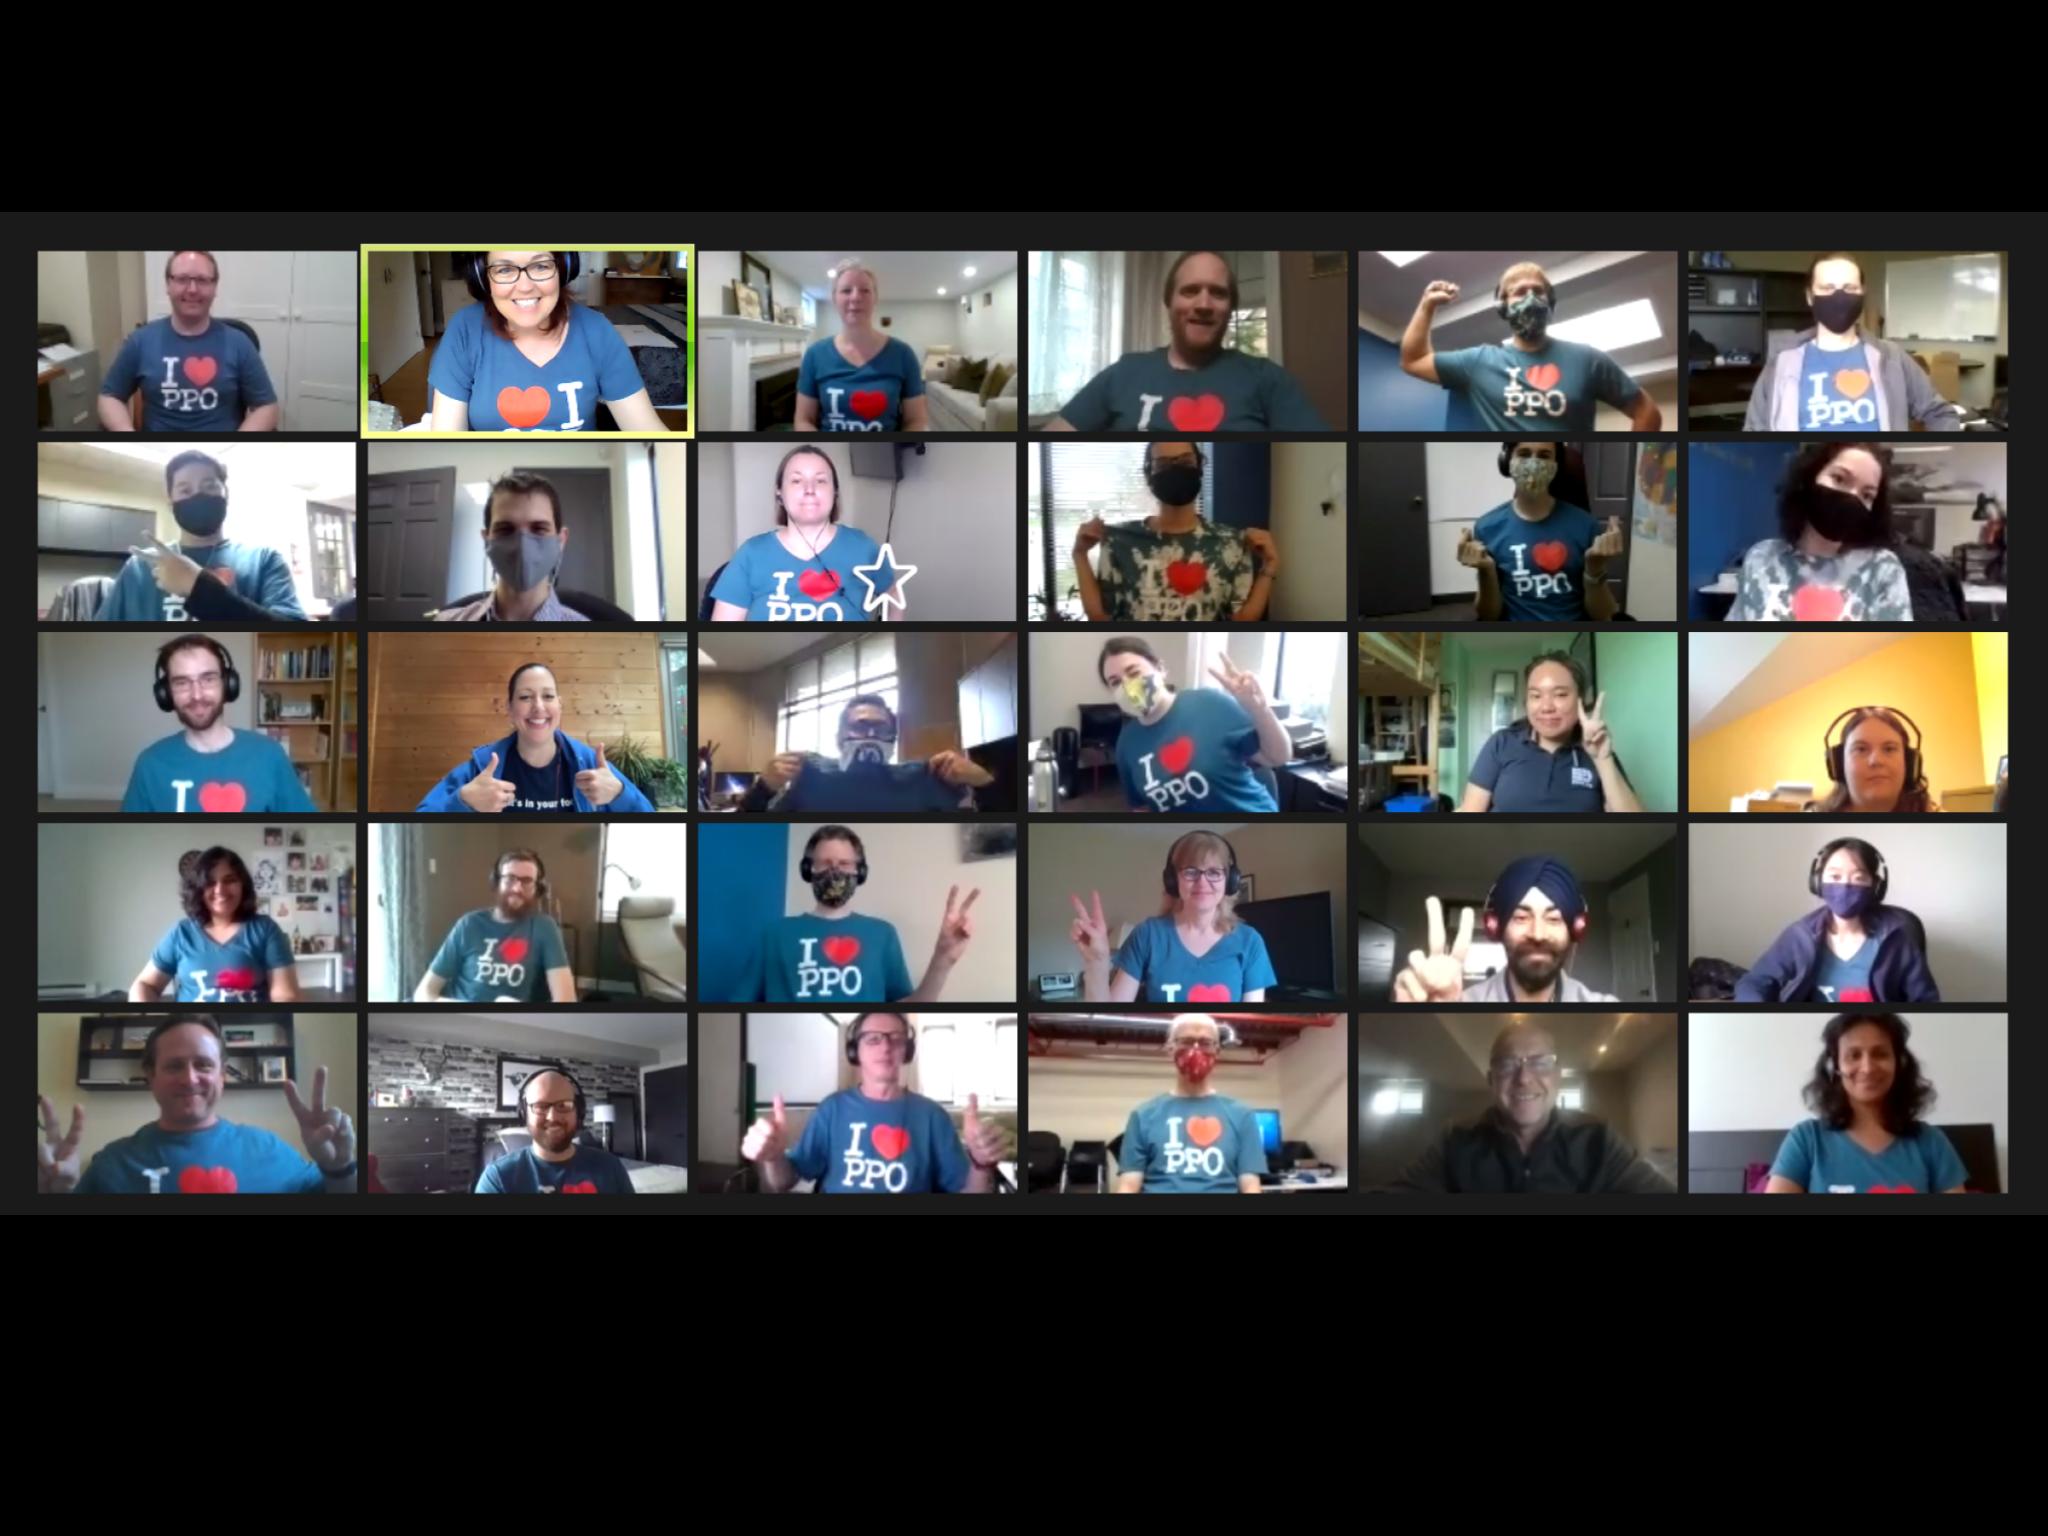 Screenshot of PPO team